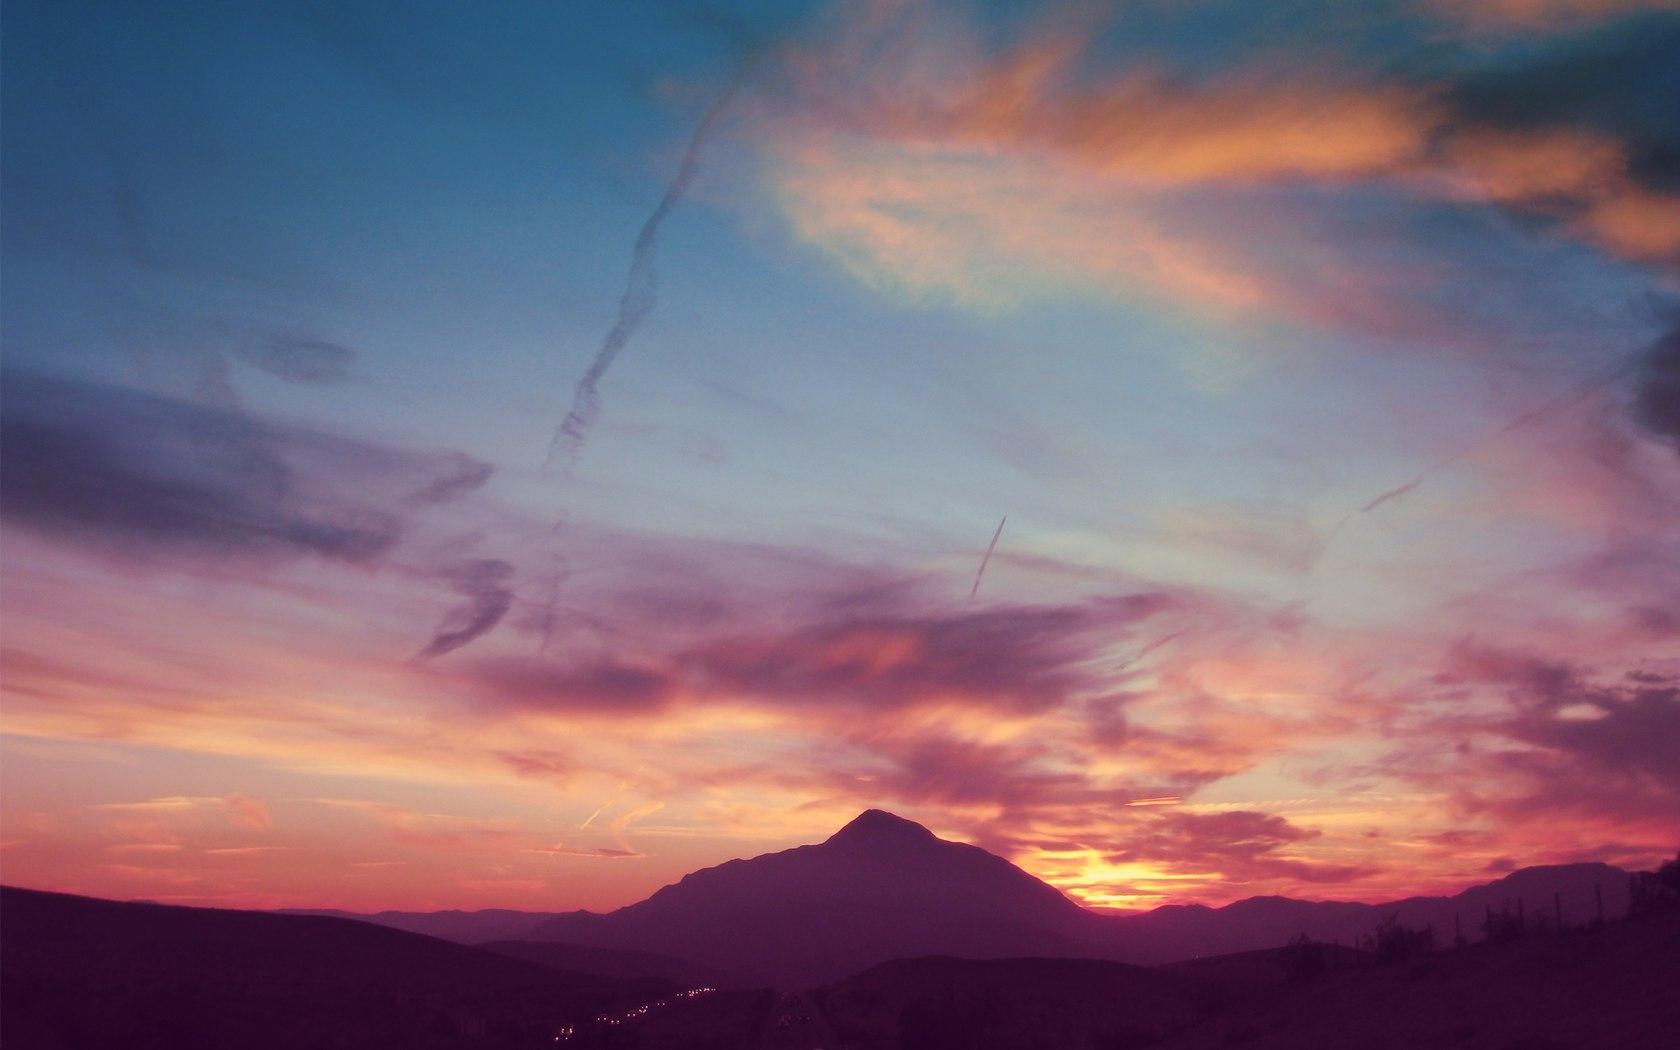 Beautiful Scenery Hd Wallpapers Free Download Evening - Wallpaper , HD Wallpaper & Backgrounds